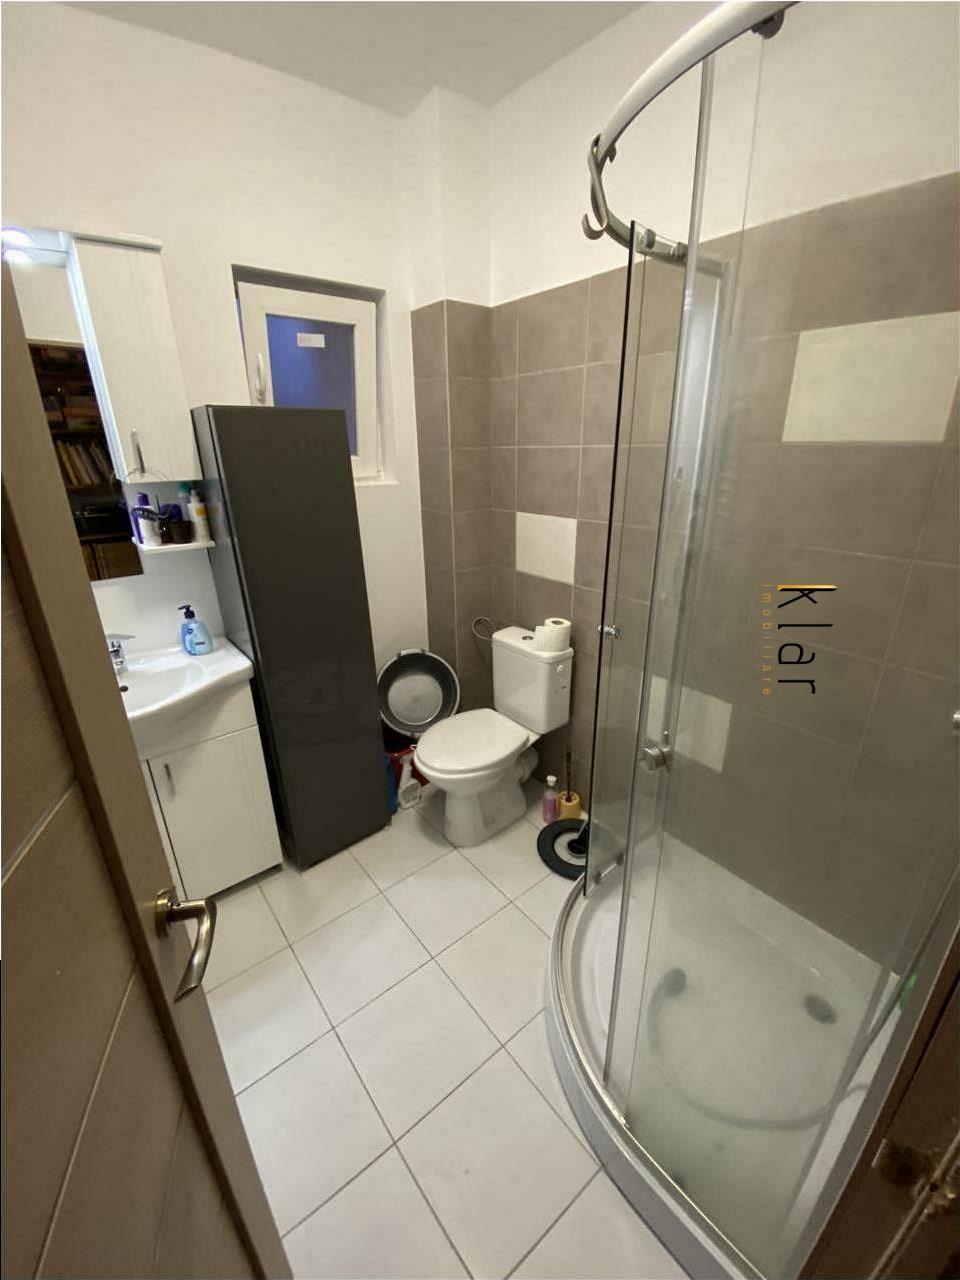 Oportunitate! Apartament 2 camere, mobilat si utilat, zona Tineretului